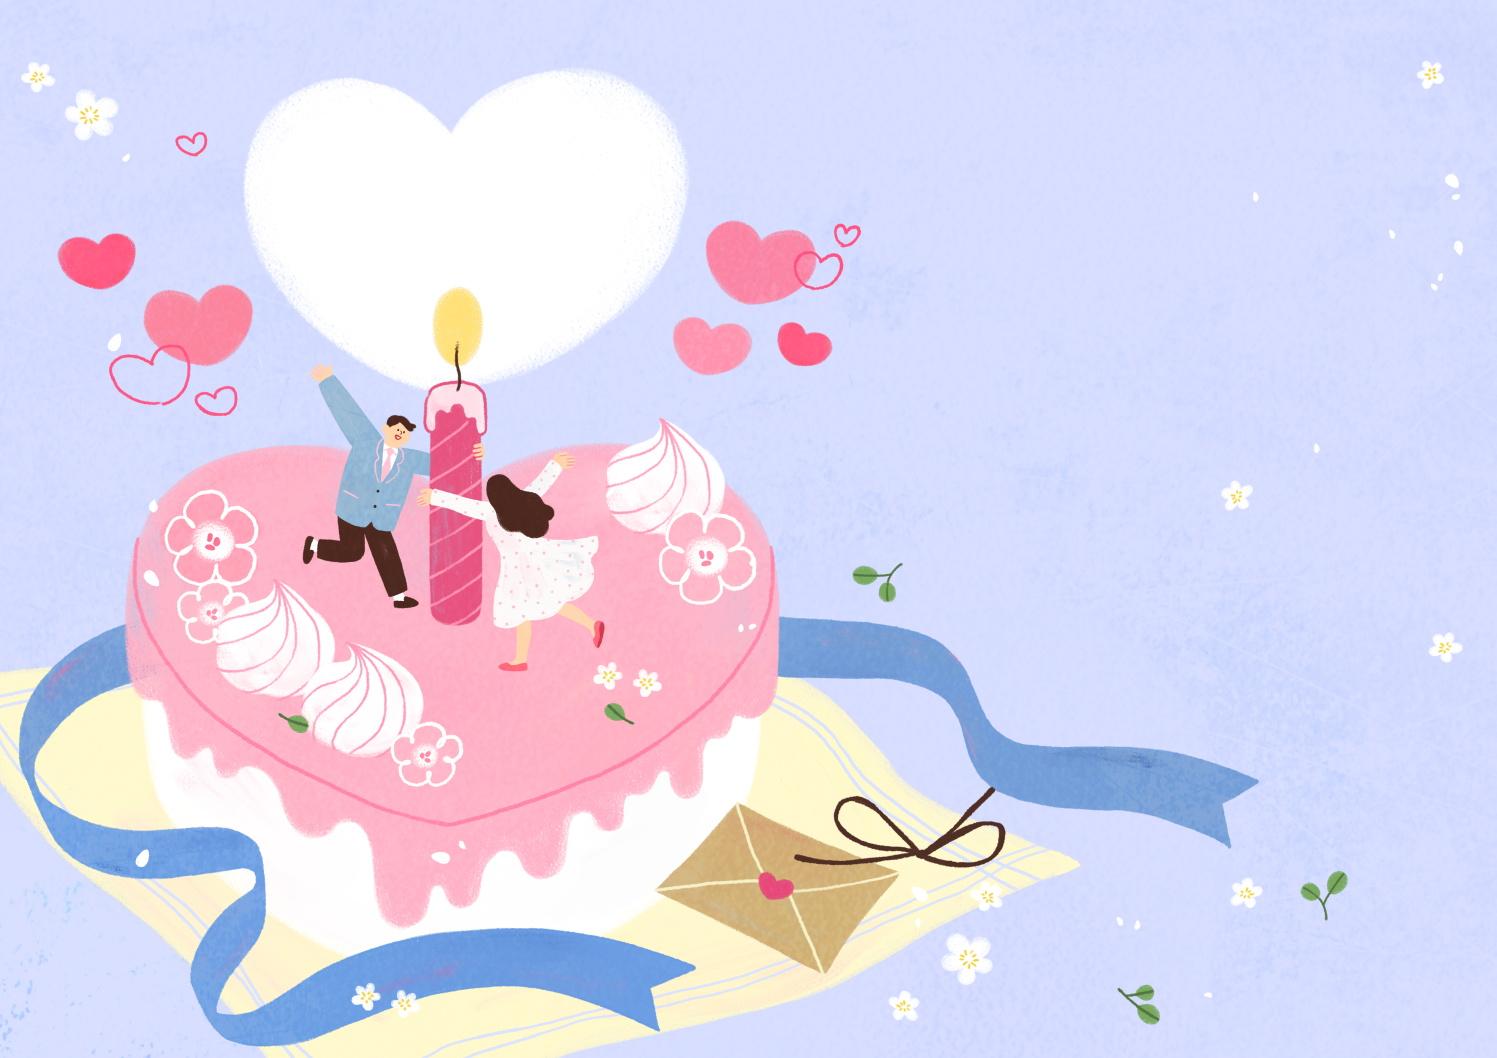 12款情人节七夕情侣手绘插画海报传单设计PSD素材 Valentines Day Couple Hand Drawn Illustration插图